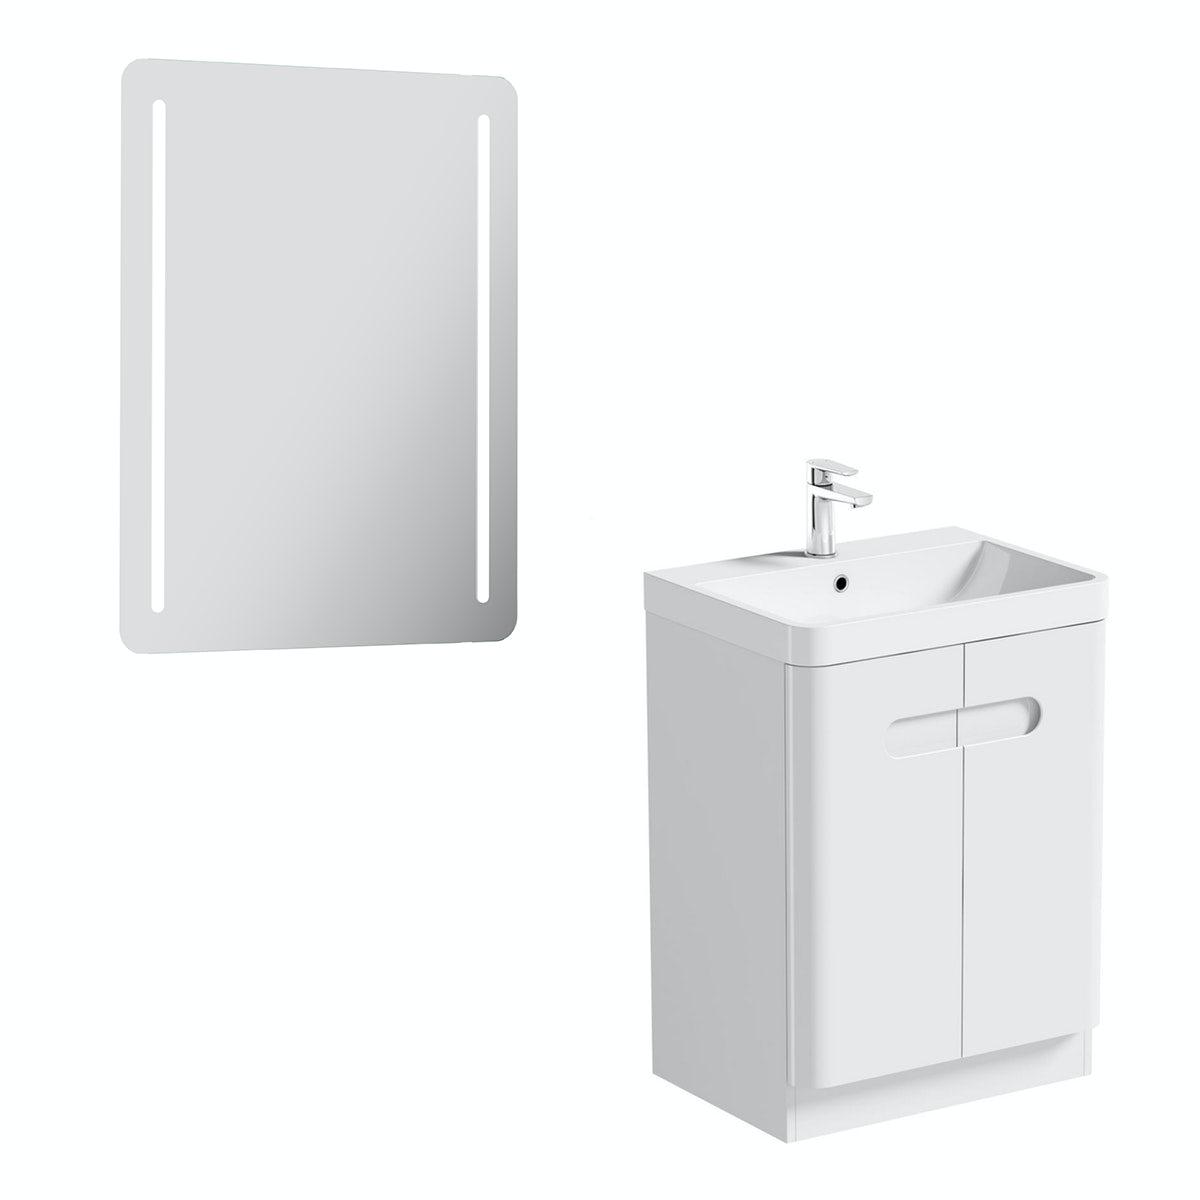 Mode Ellis white vanity door unit 600mm and mirror offer